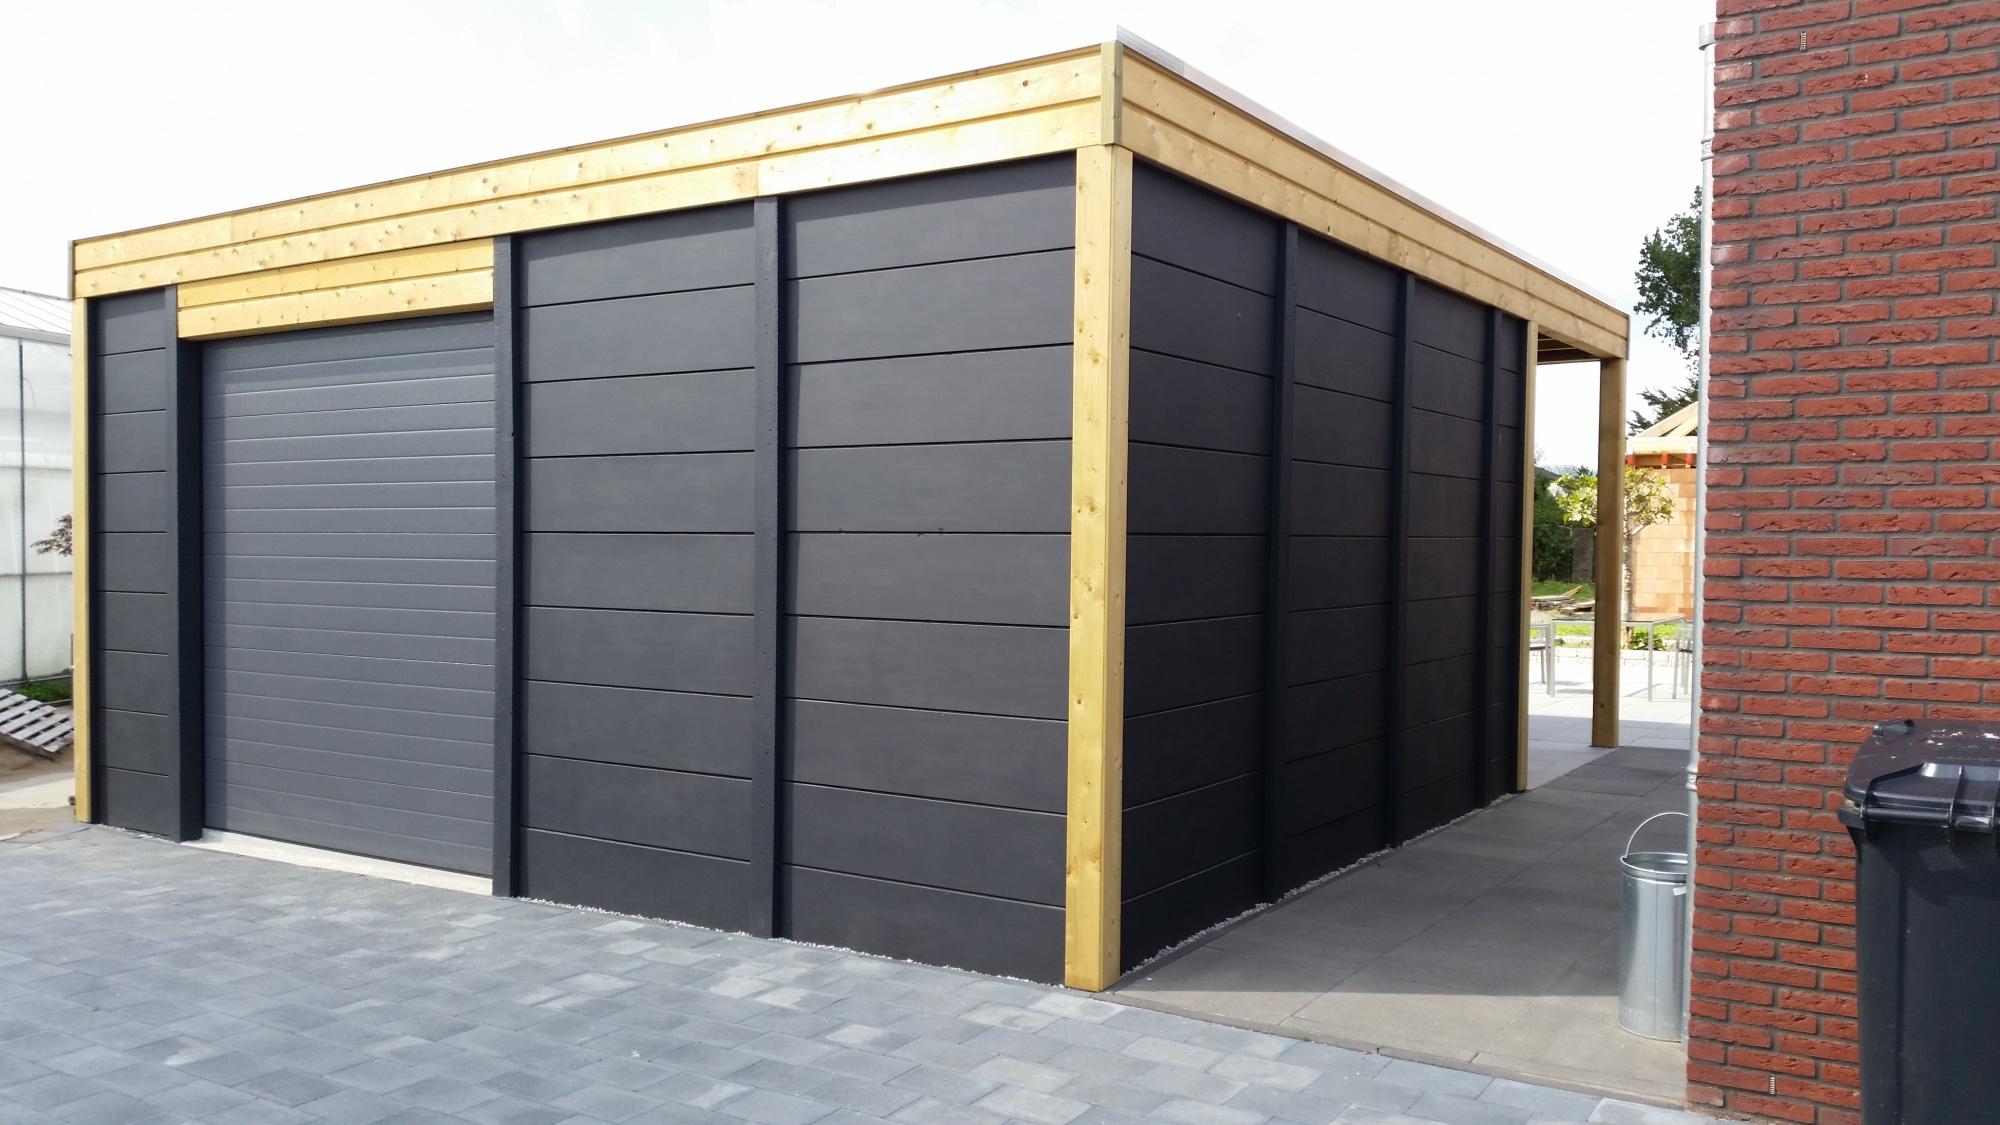 garage bton prix garage m beton prefabrique with garage bton beton cire beton floor preise. Black Bedroom Furniture Sets. Home Design Ideas